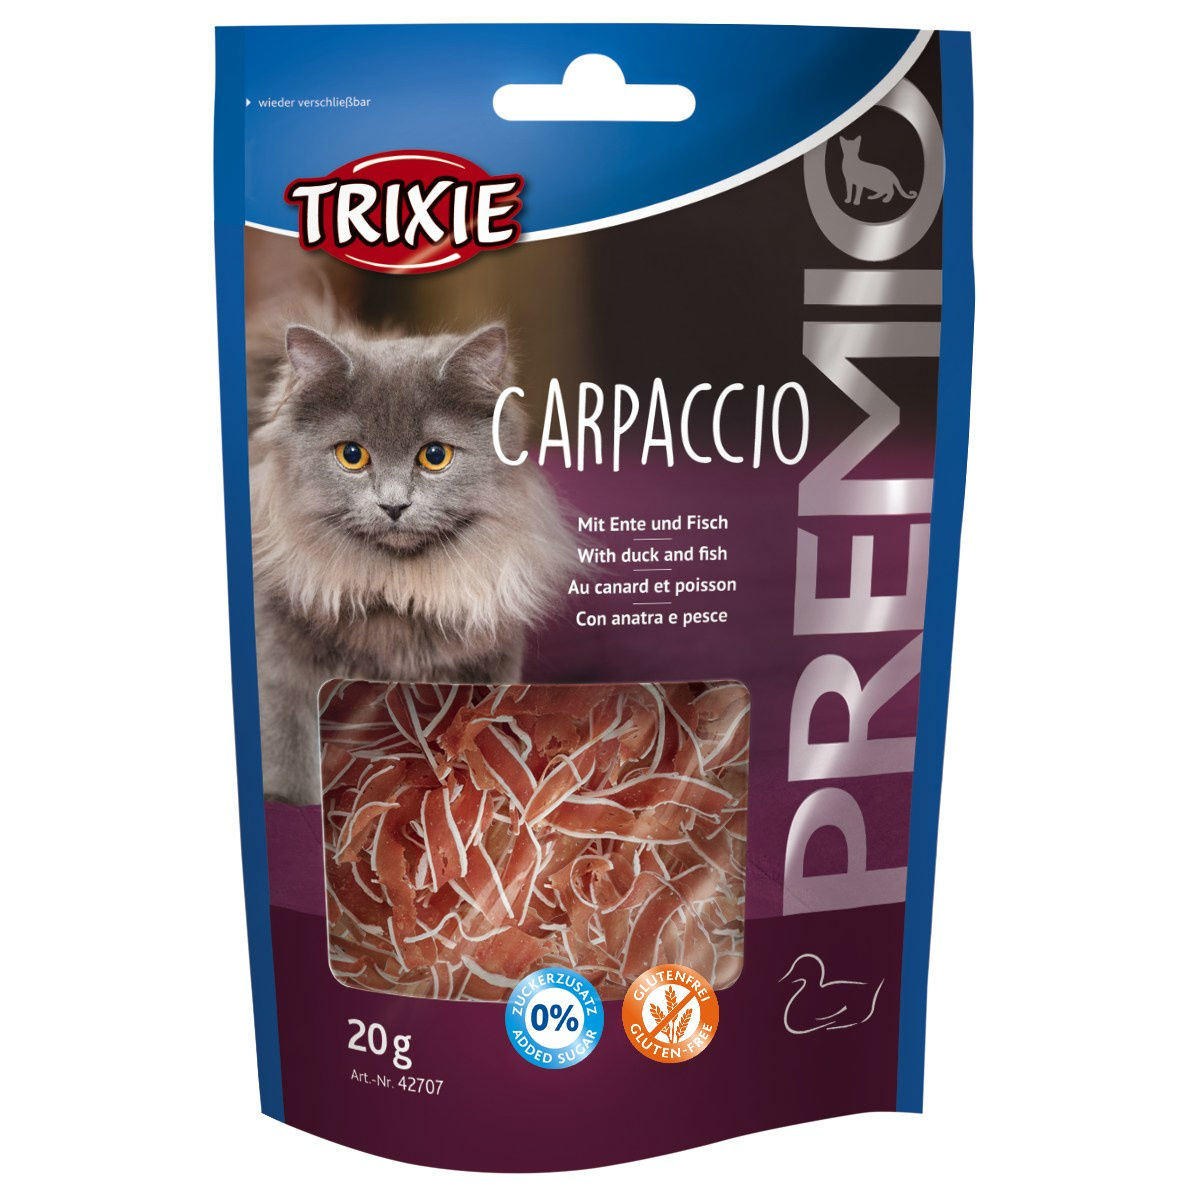 Trixie PREMIO Carpaccio Katzensnack 42707